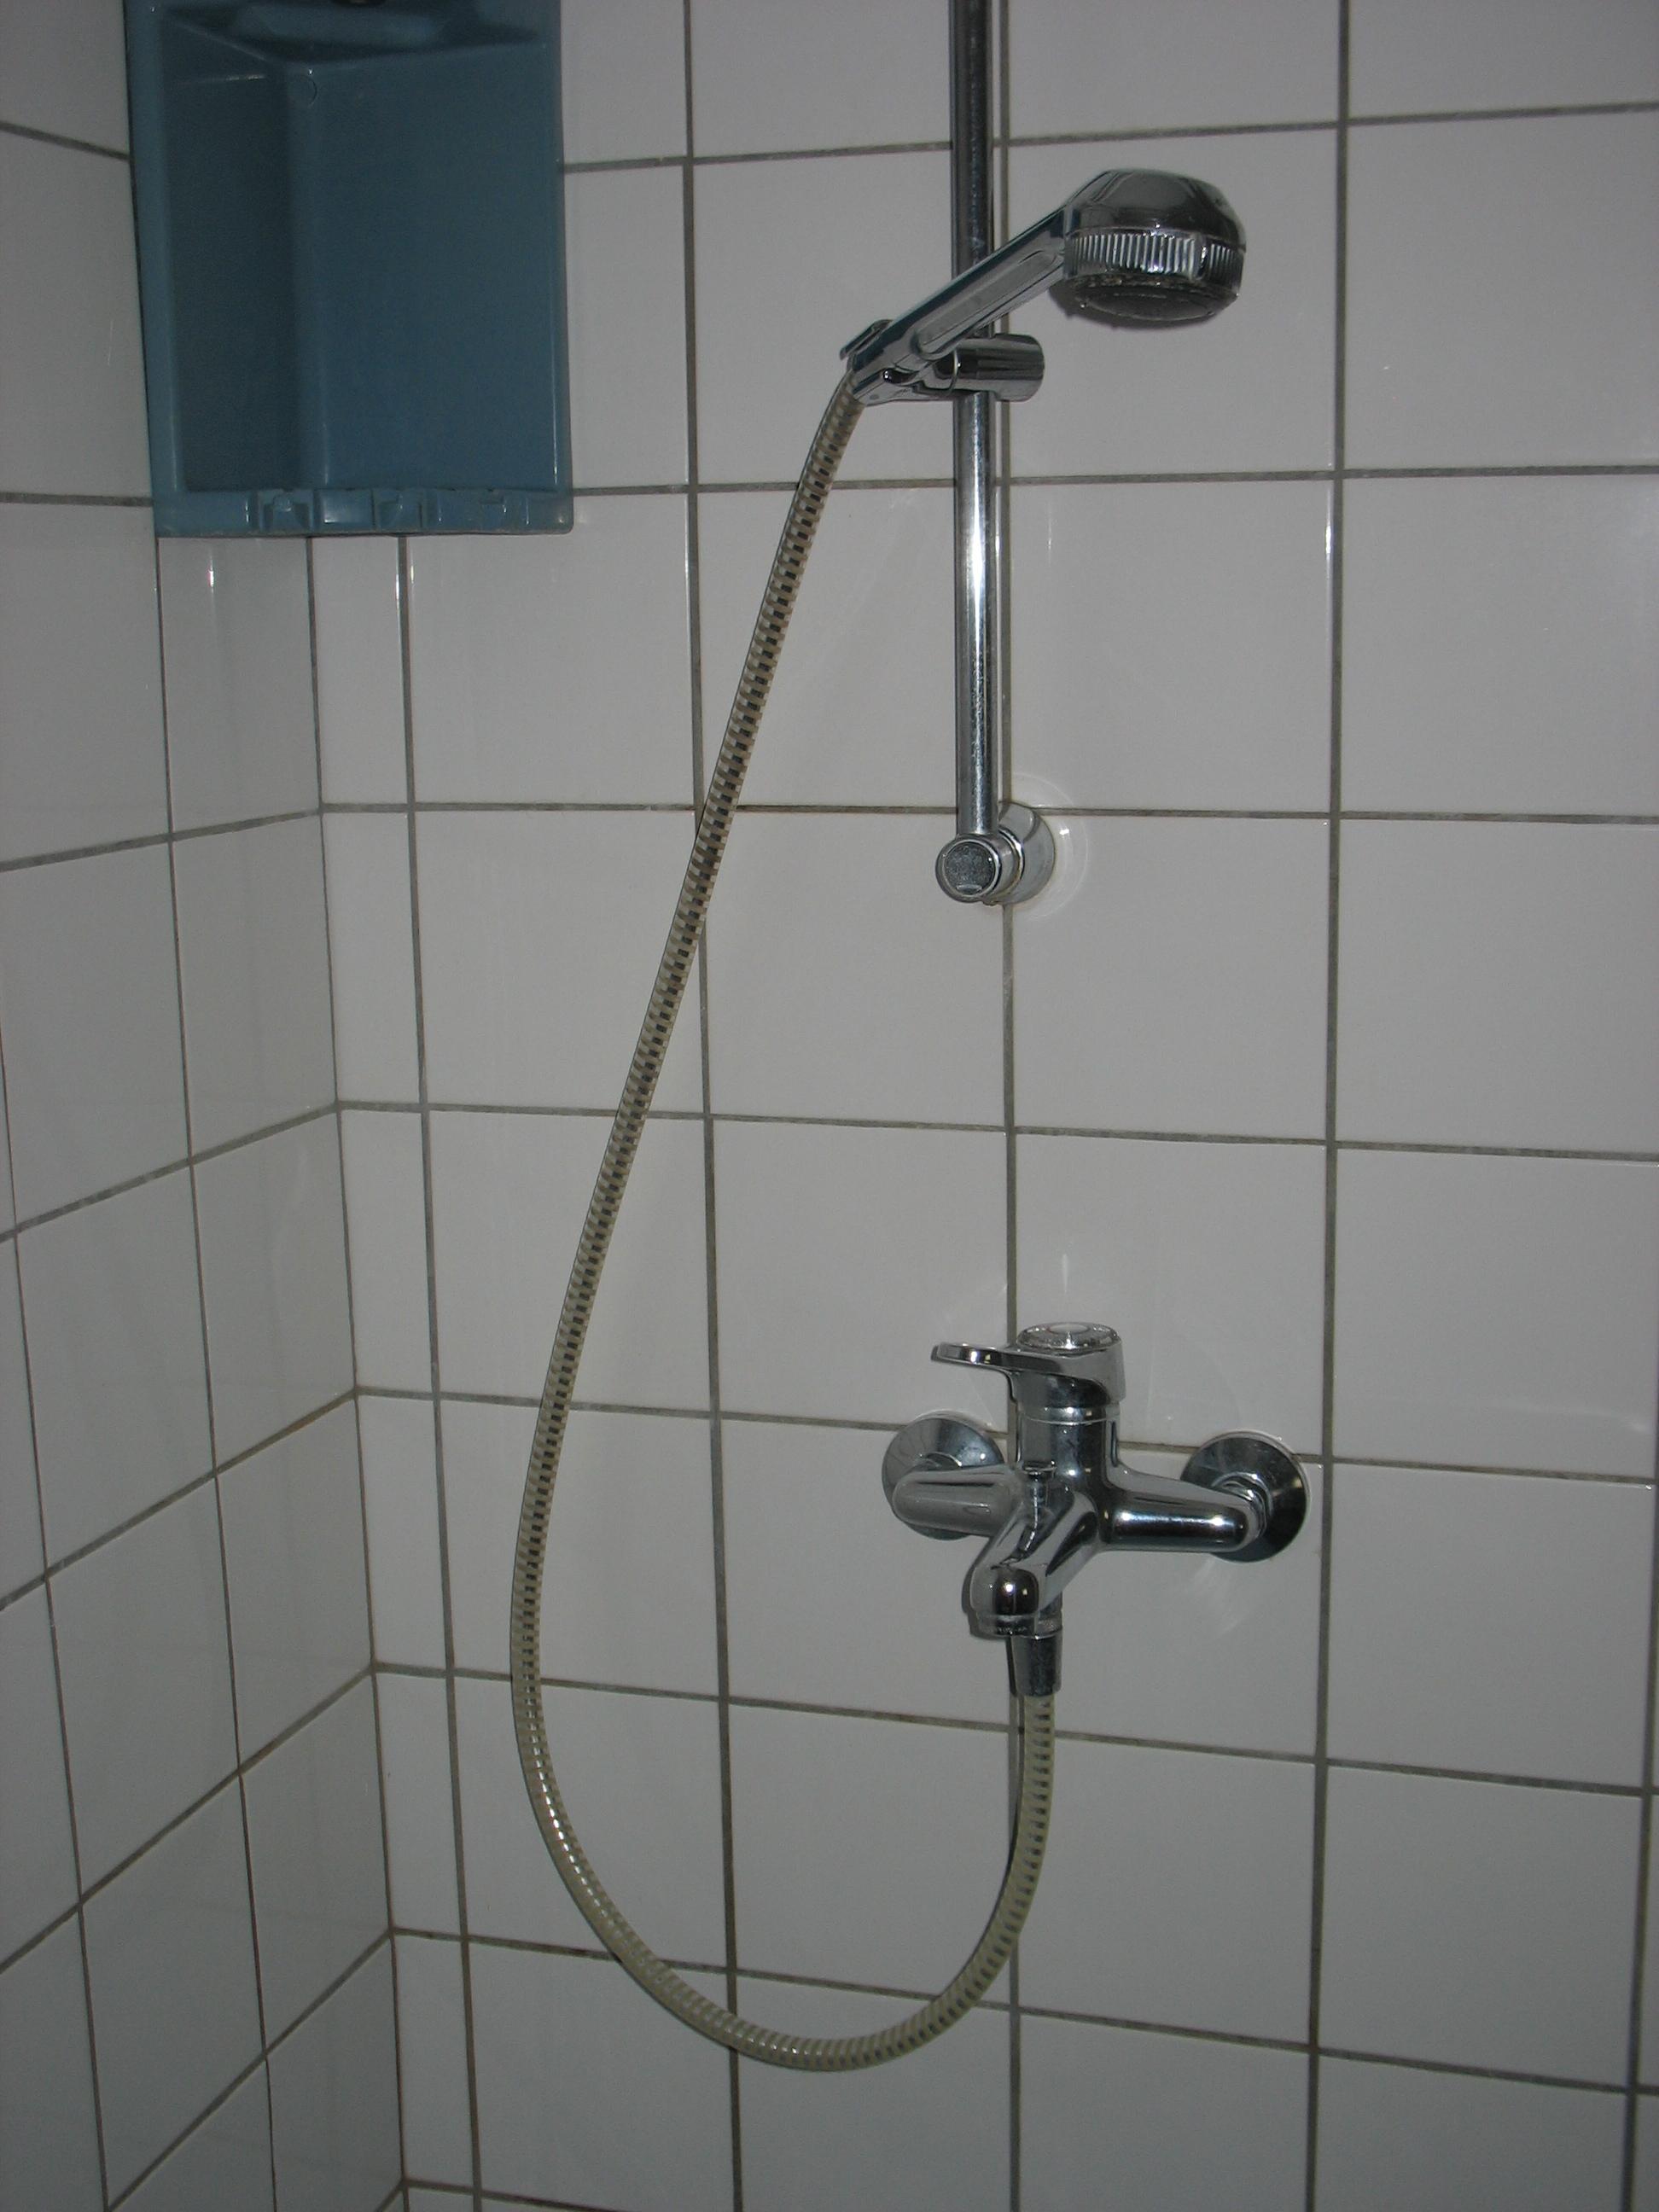 File:Shower tap german0907.JPG - Wikimedia Commons